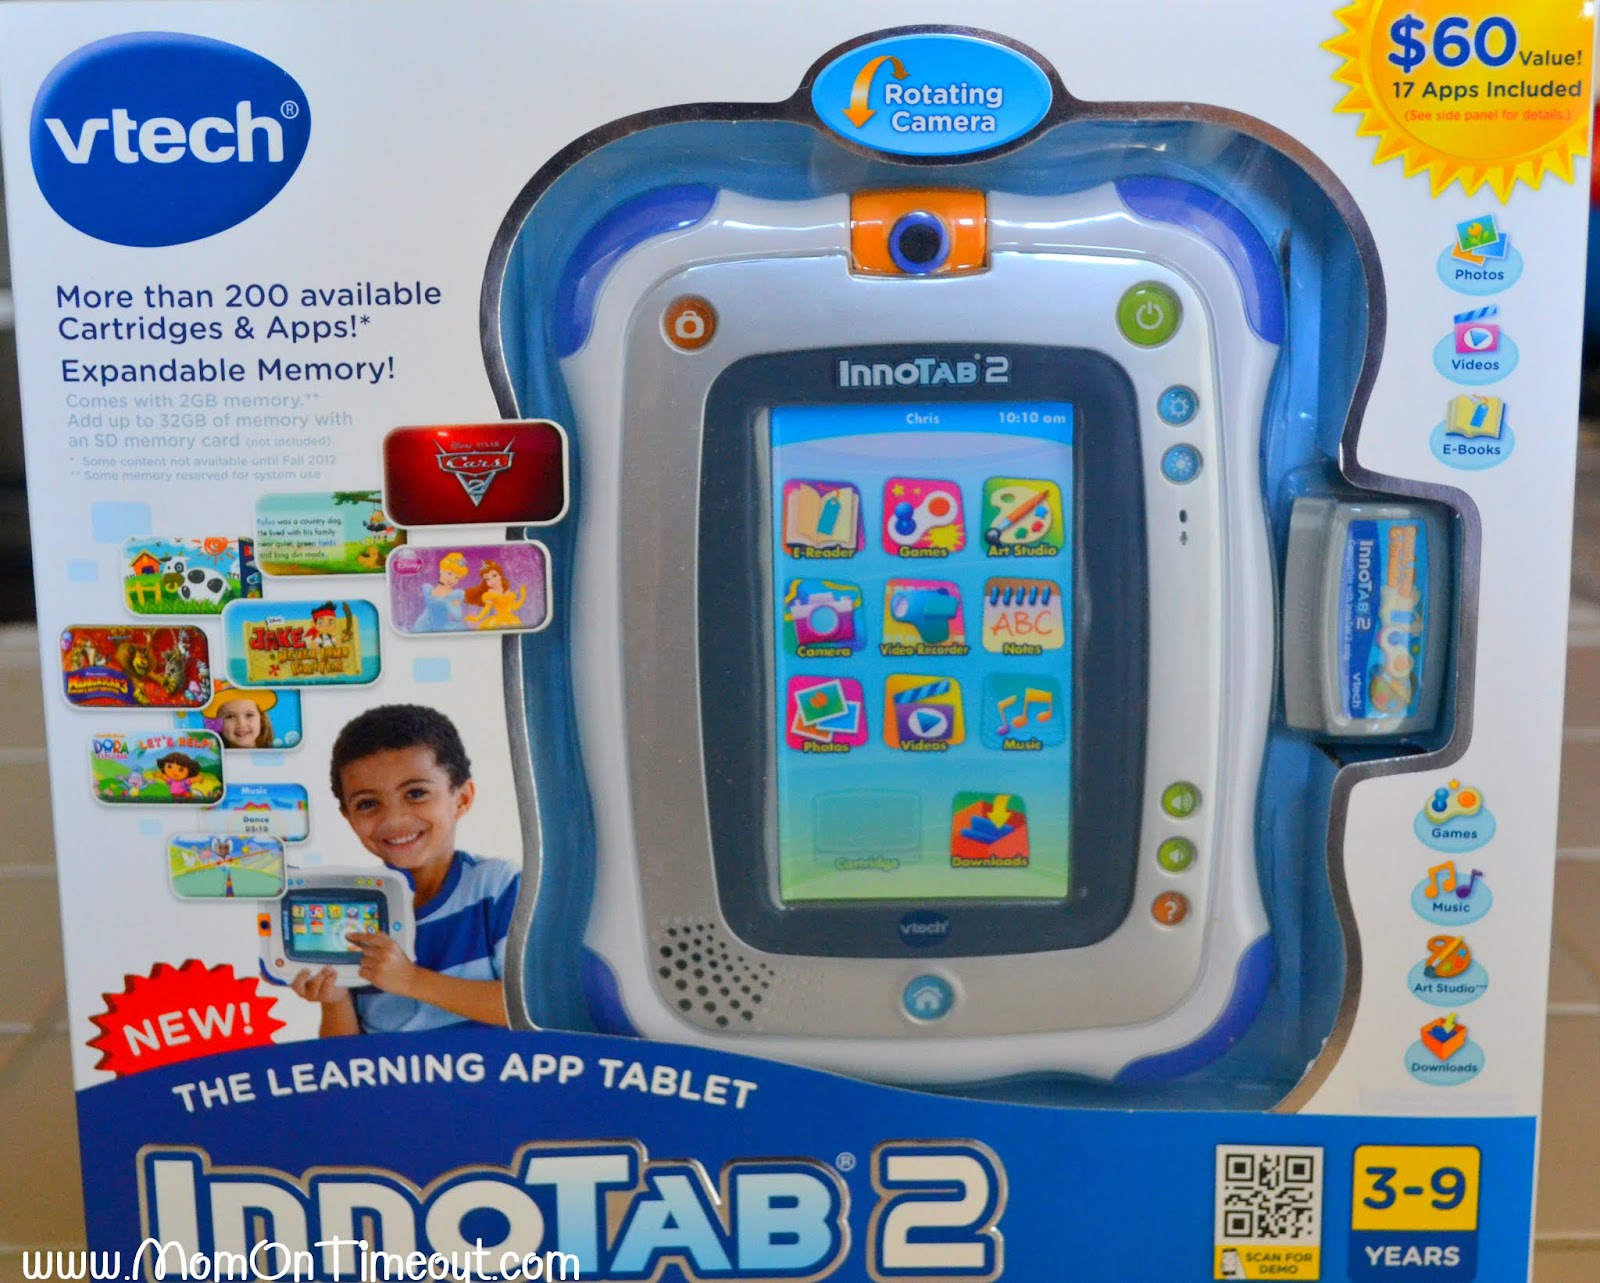 Vtech Innotab 2 Games